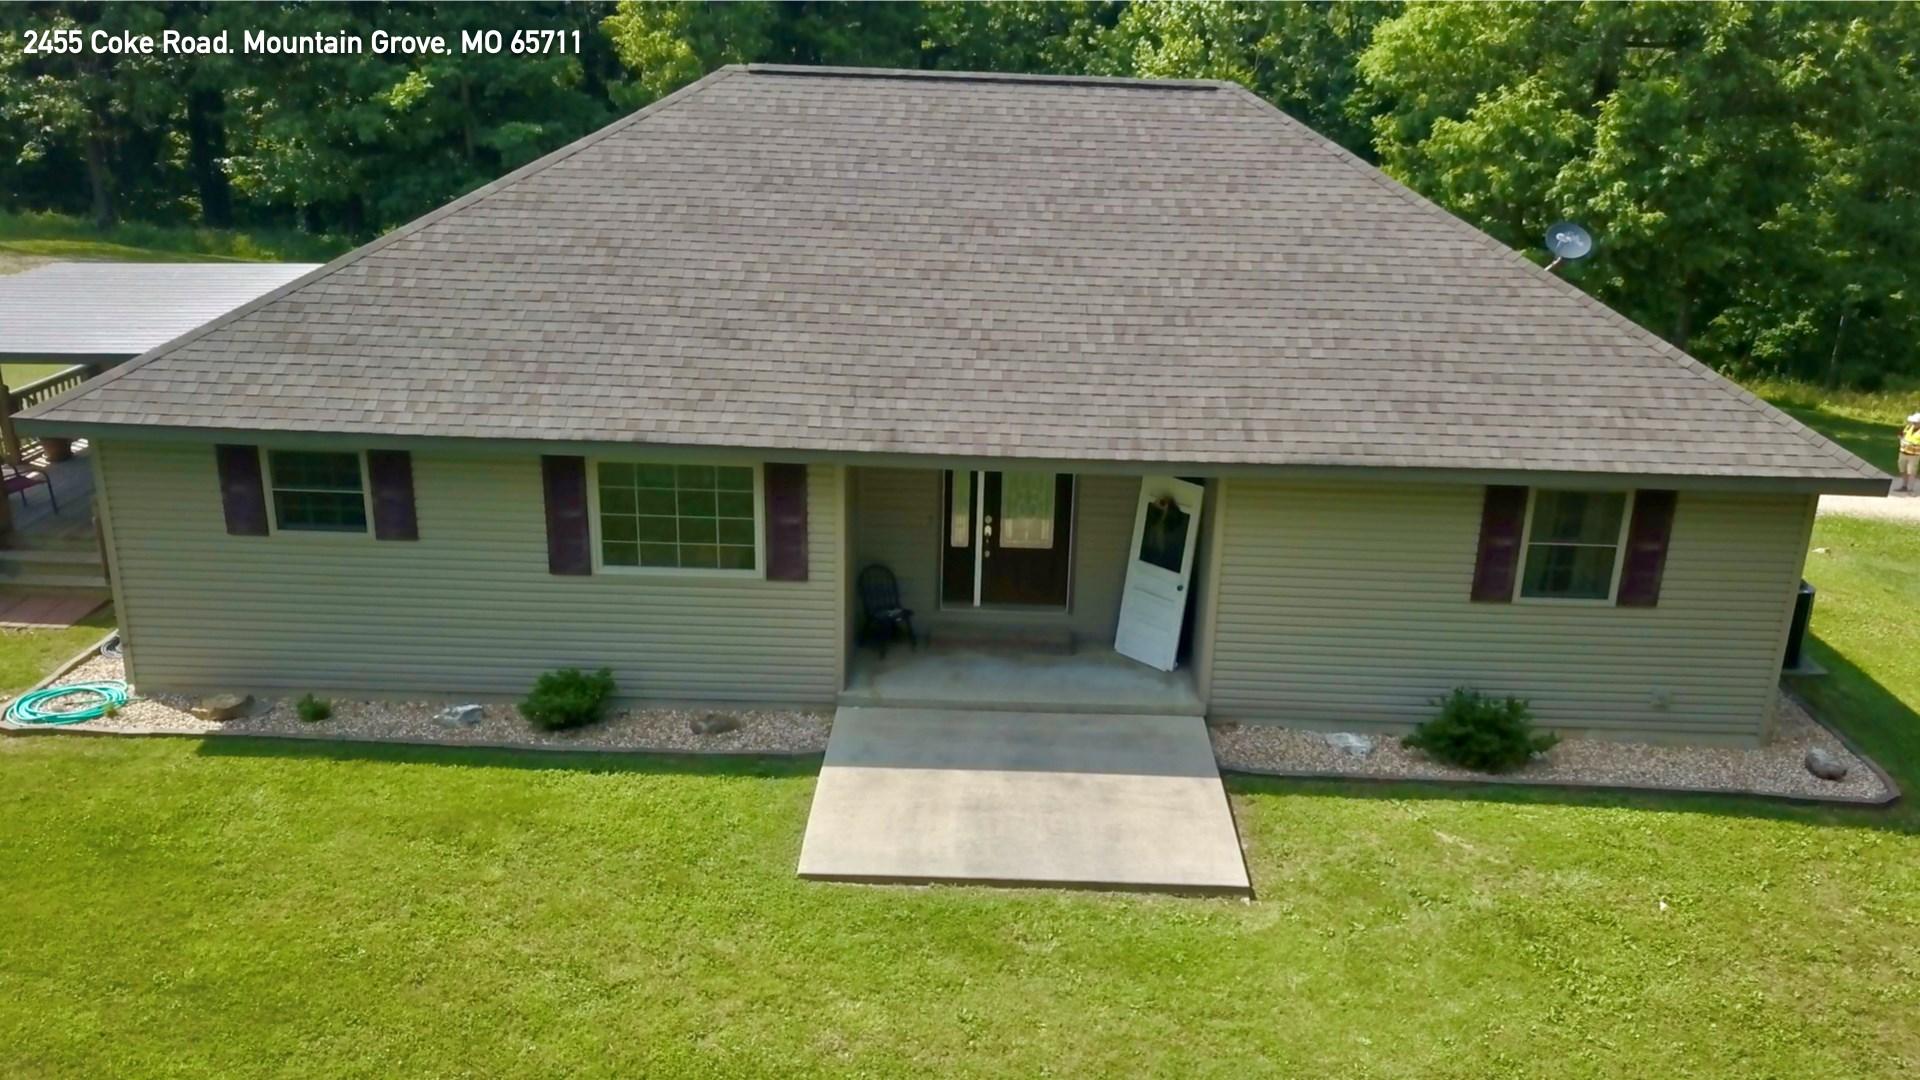 Southern Missouri Home for Sale - Mountain Grove, MO